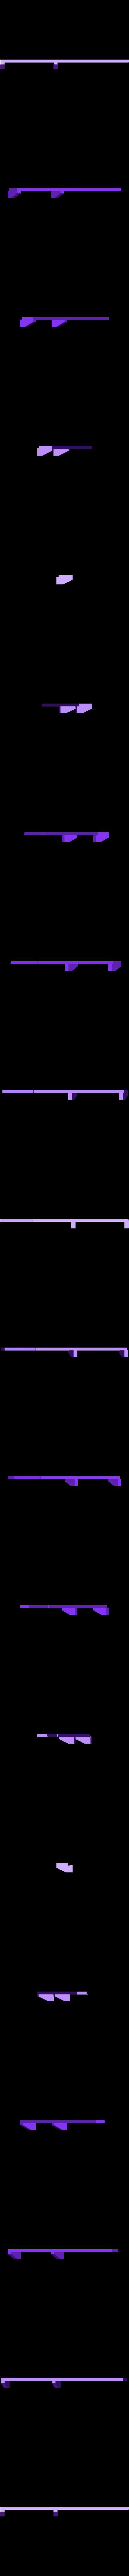 Run_Board_Back-B.STL Download free STL file 4-8-8-4 Big Boy Locomotive • 3D printer object, RaymondDeLuca